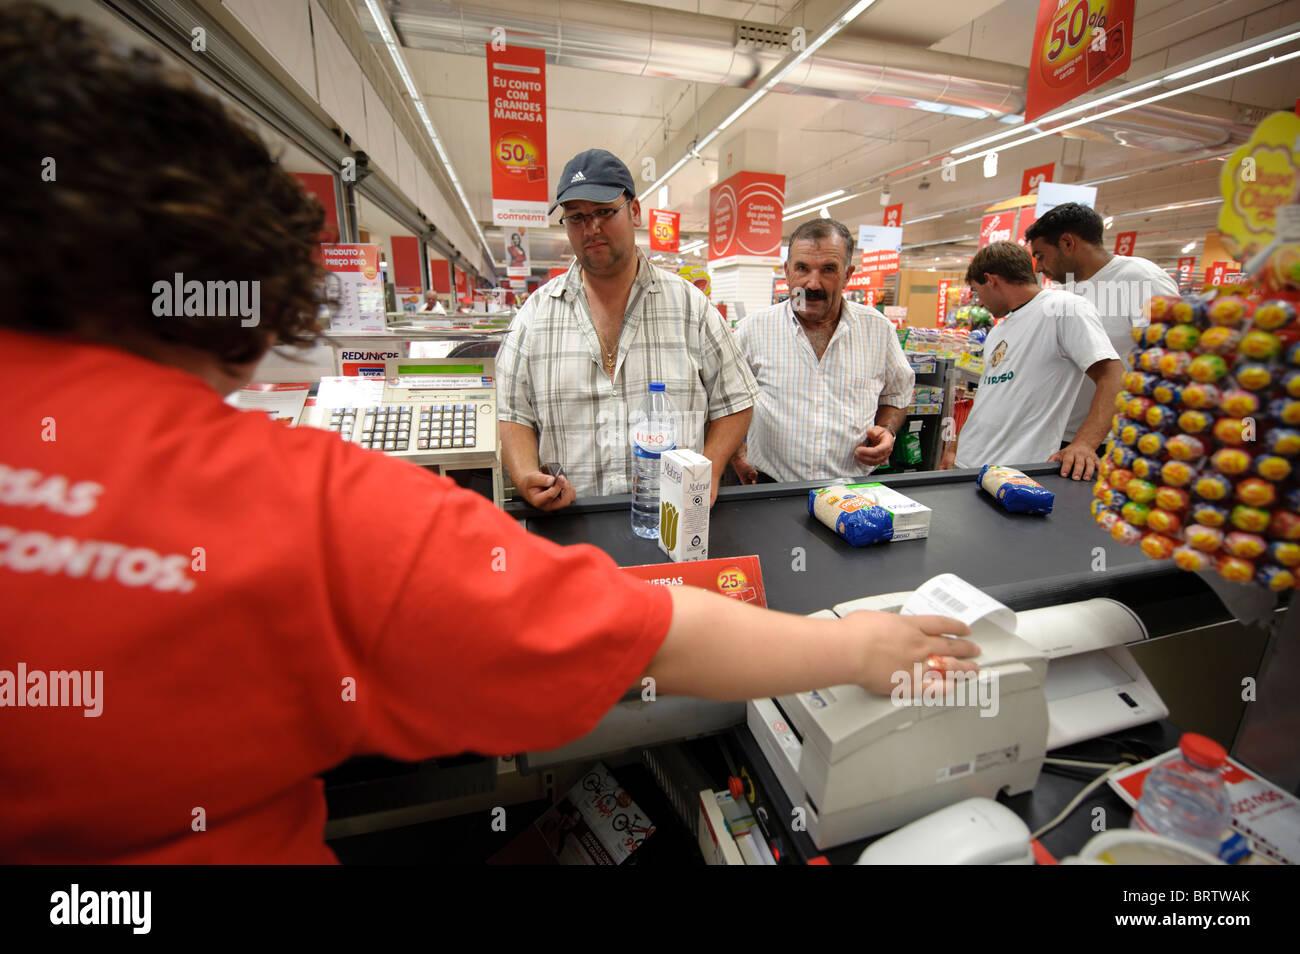 Man paying at supermarket checkout counter - Stock Image